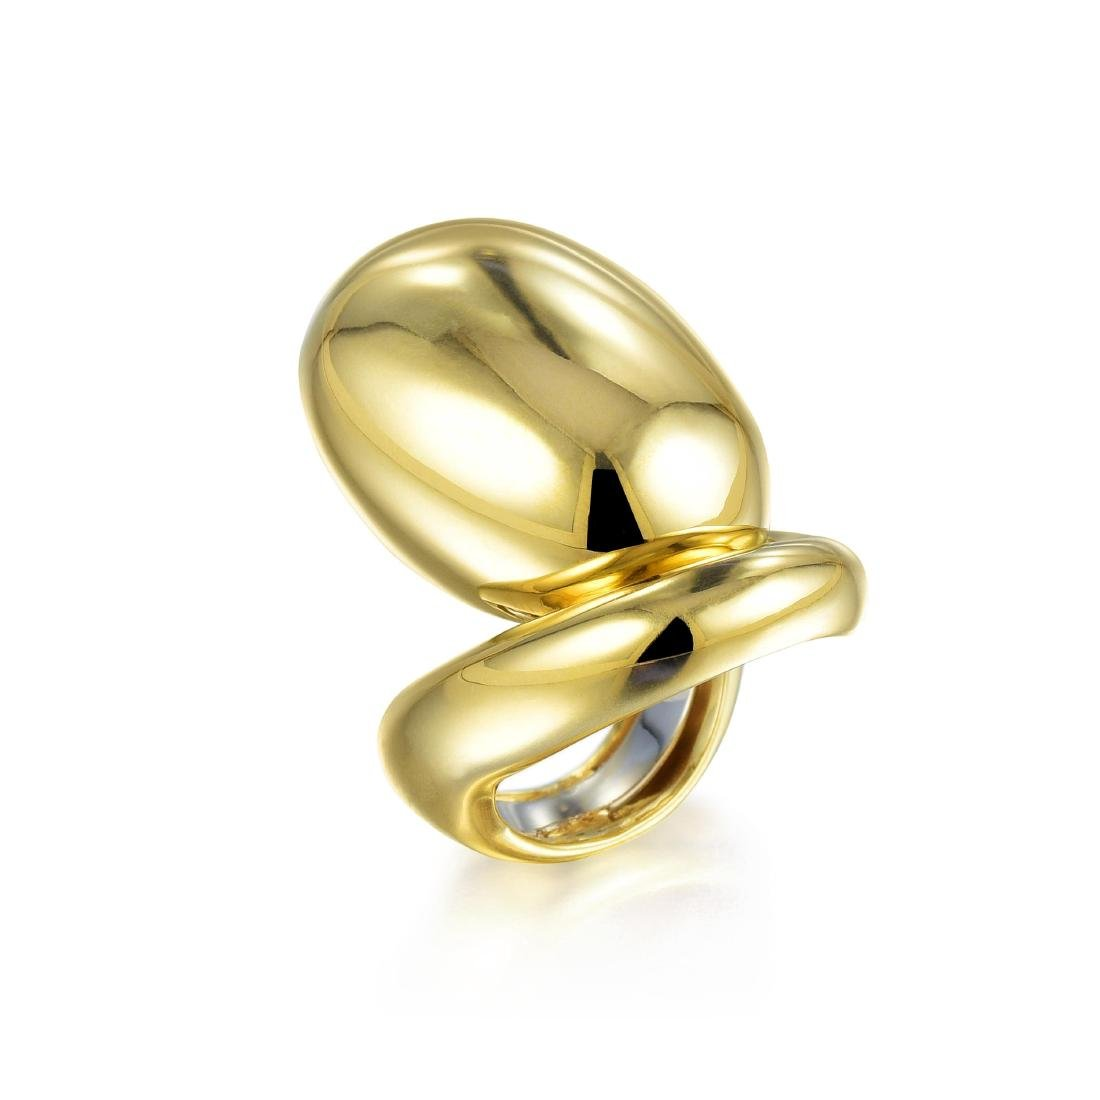 Roberto Coin 18K Gold Ring